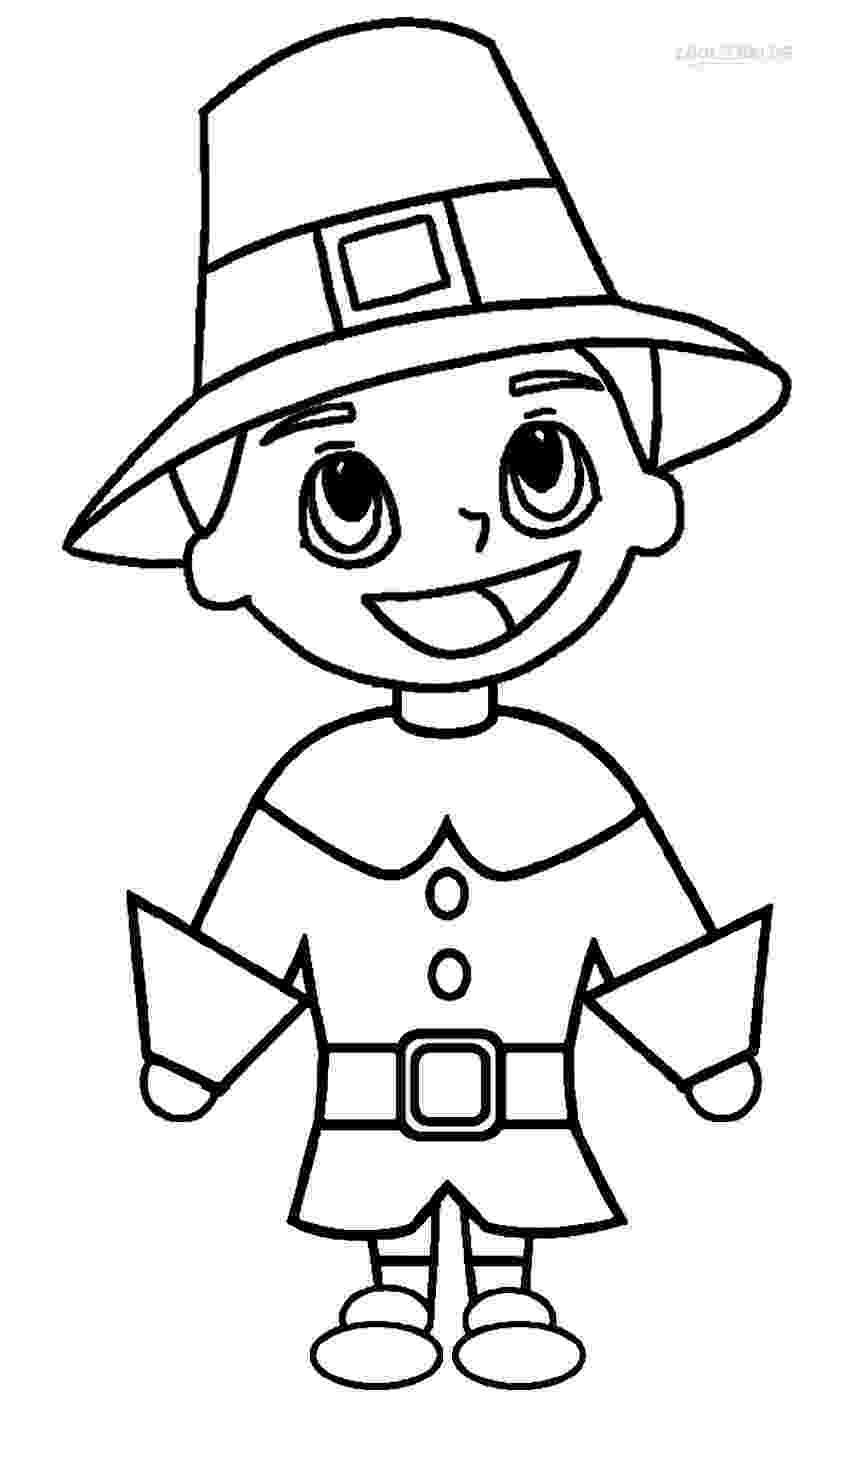 pilgrim hat coloring page church house collection blog free printable pilgrim page hat pilgrim coloring